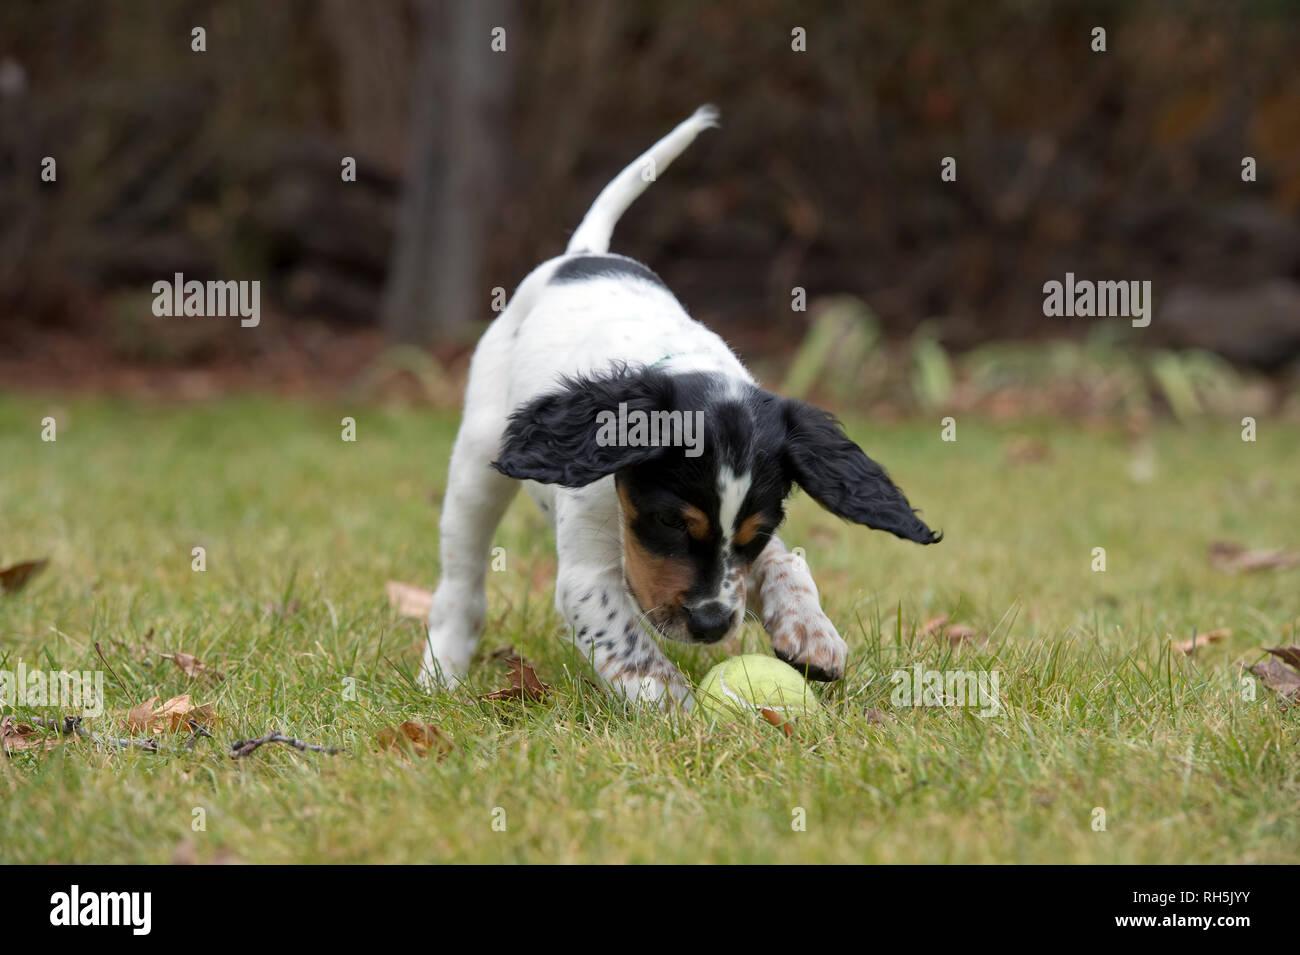 Acht Wochen alten English Setter Welpen spielen mit Tennis ball Stockbild